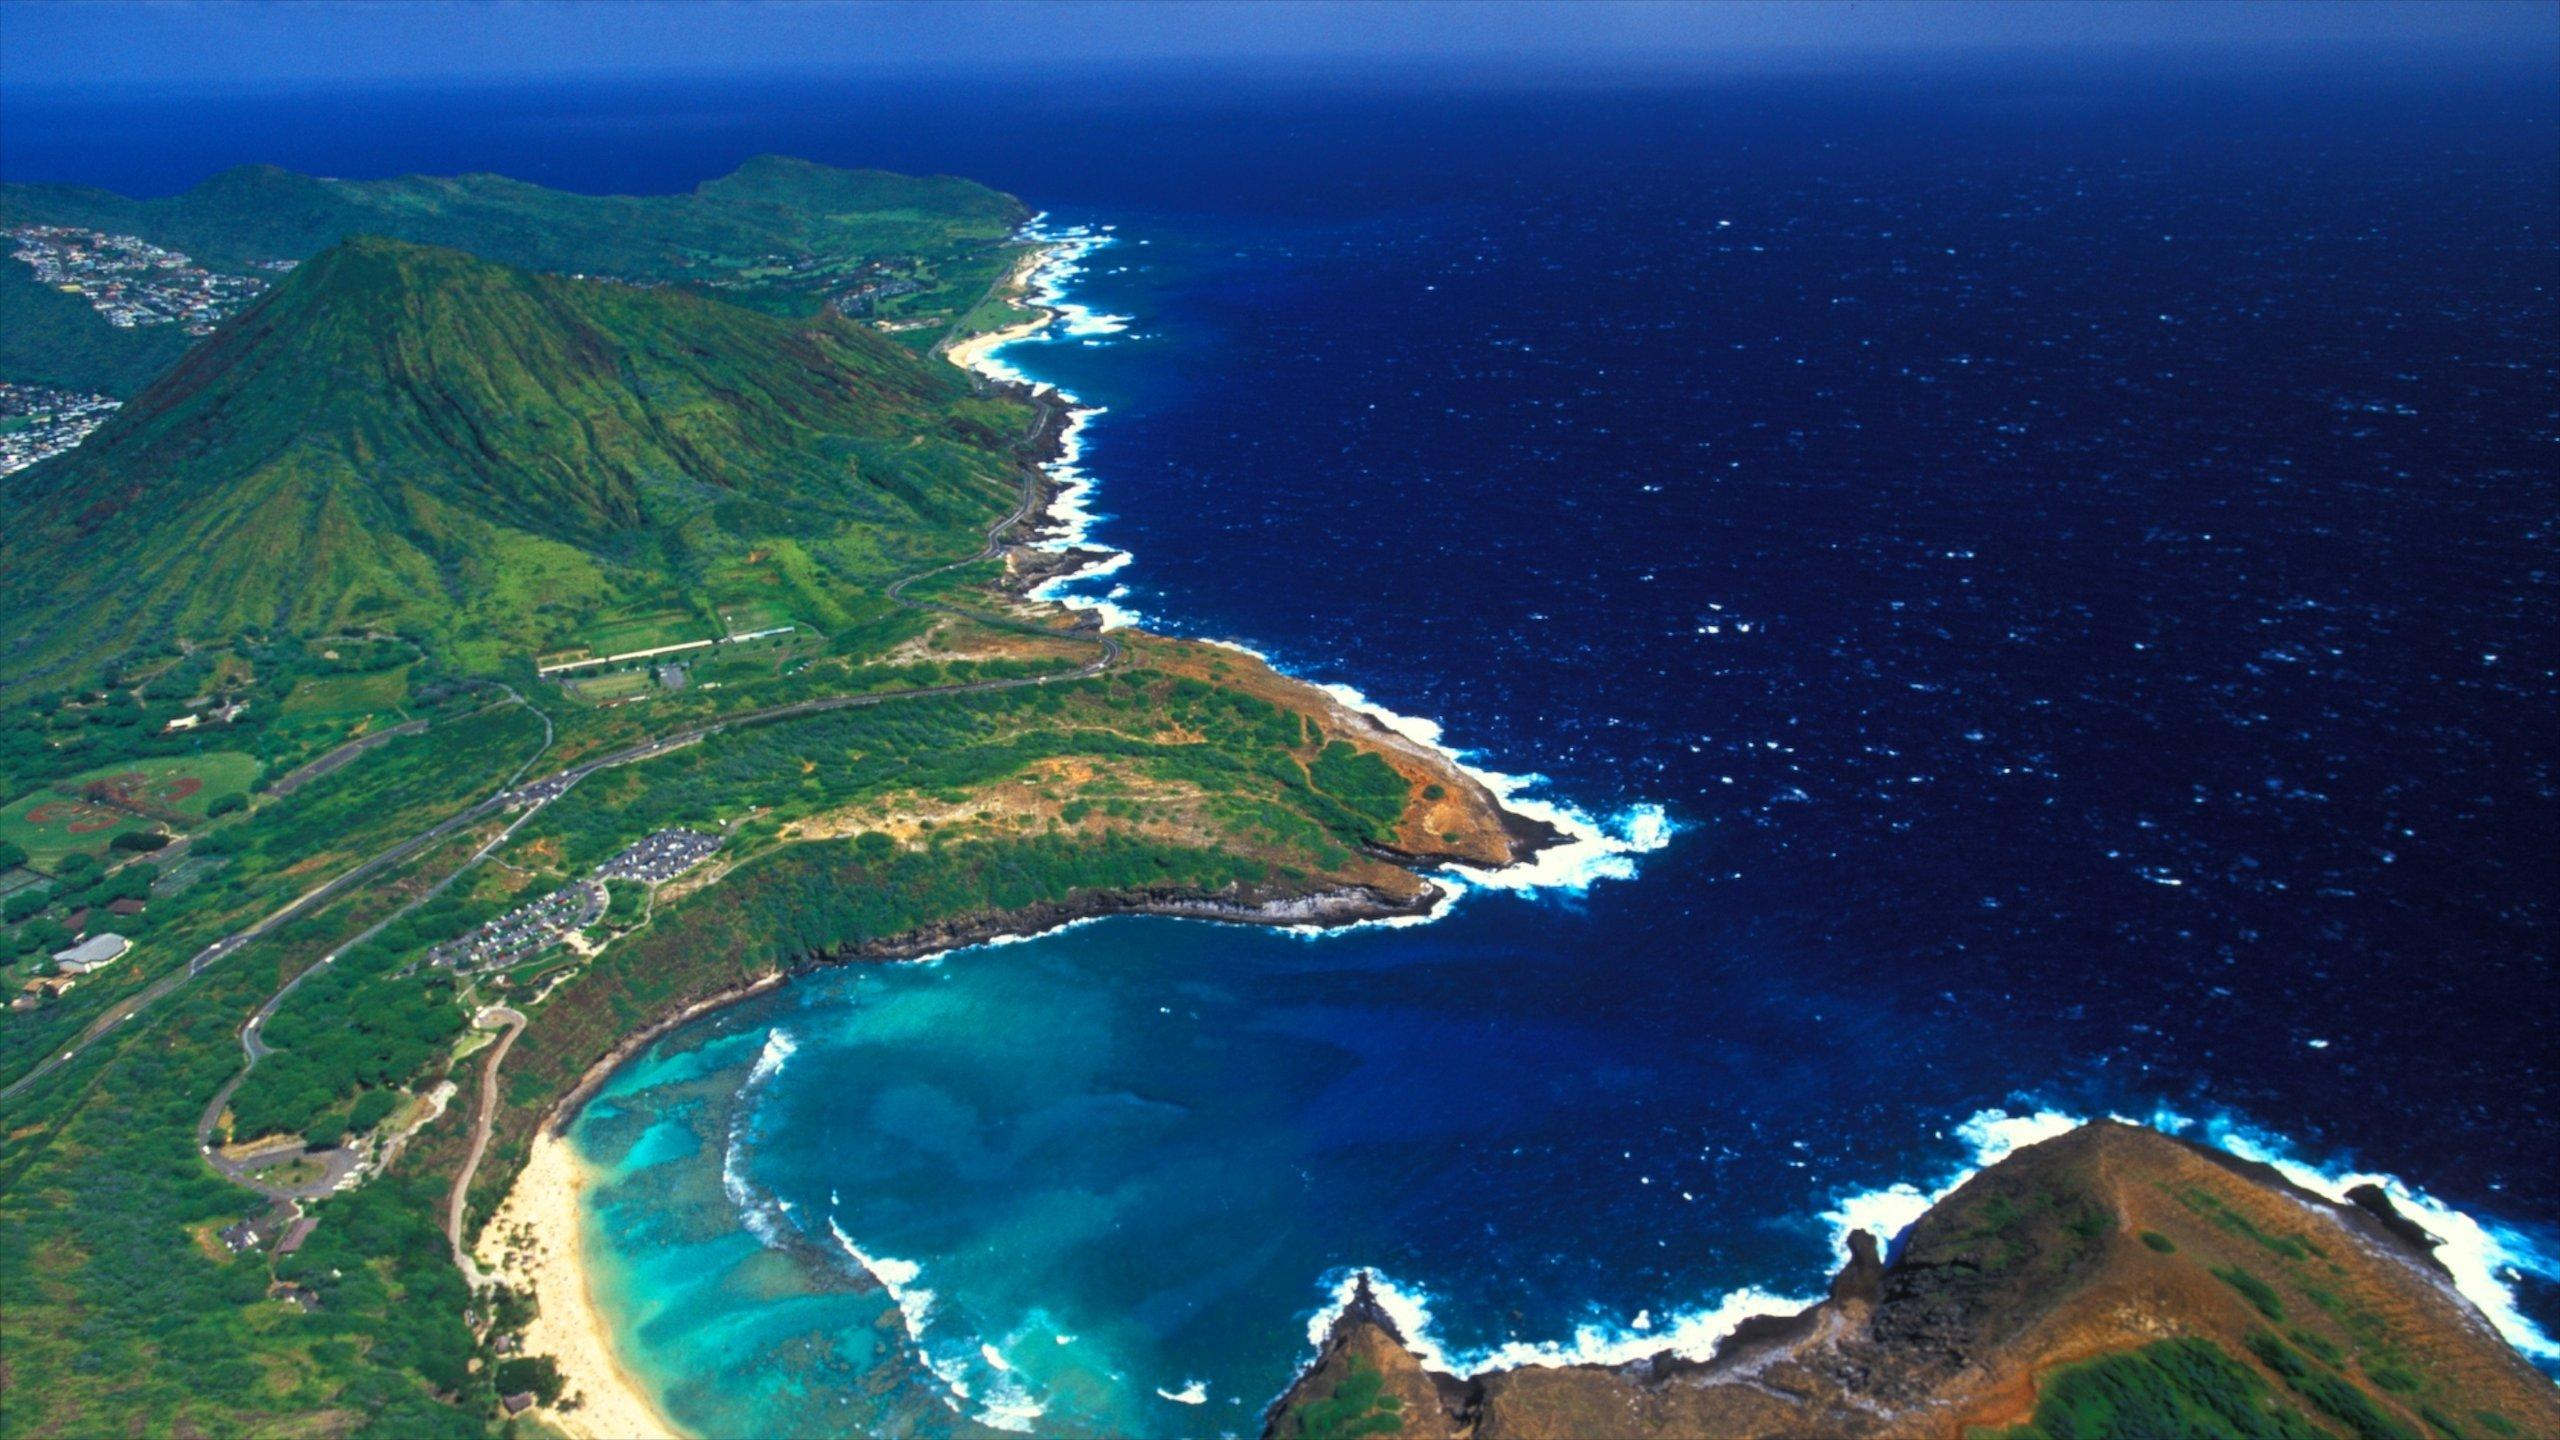 Hawaiʻi Kai, Honolulu, Hawaii, USA